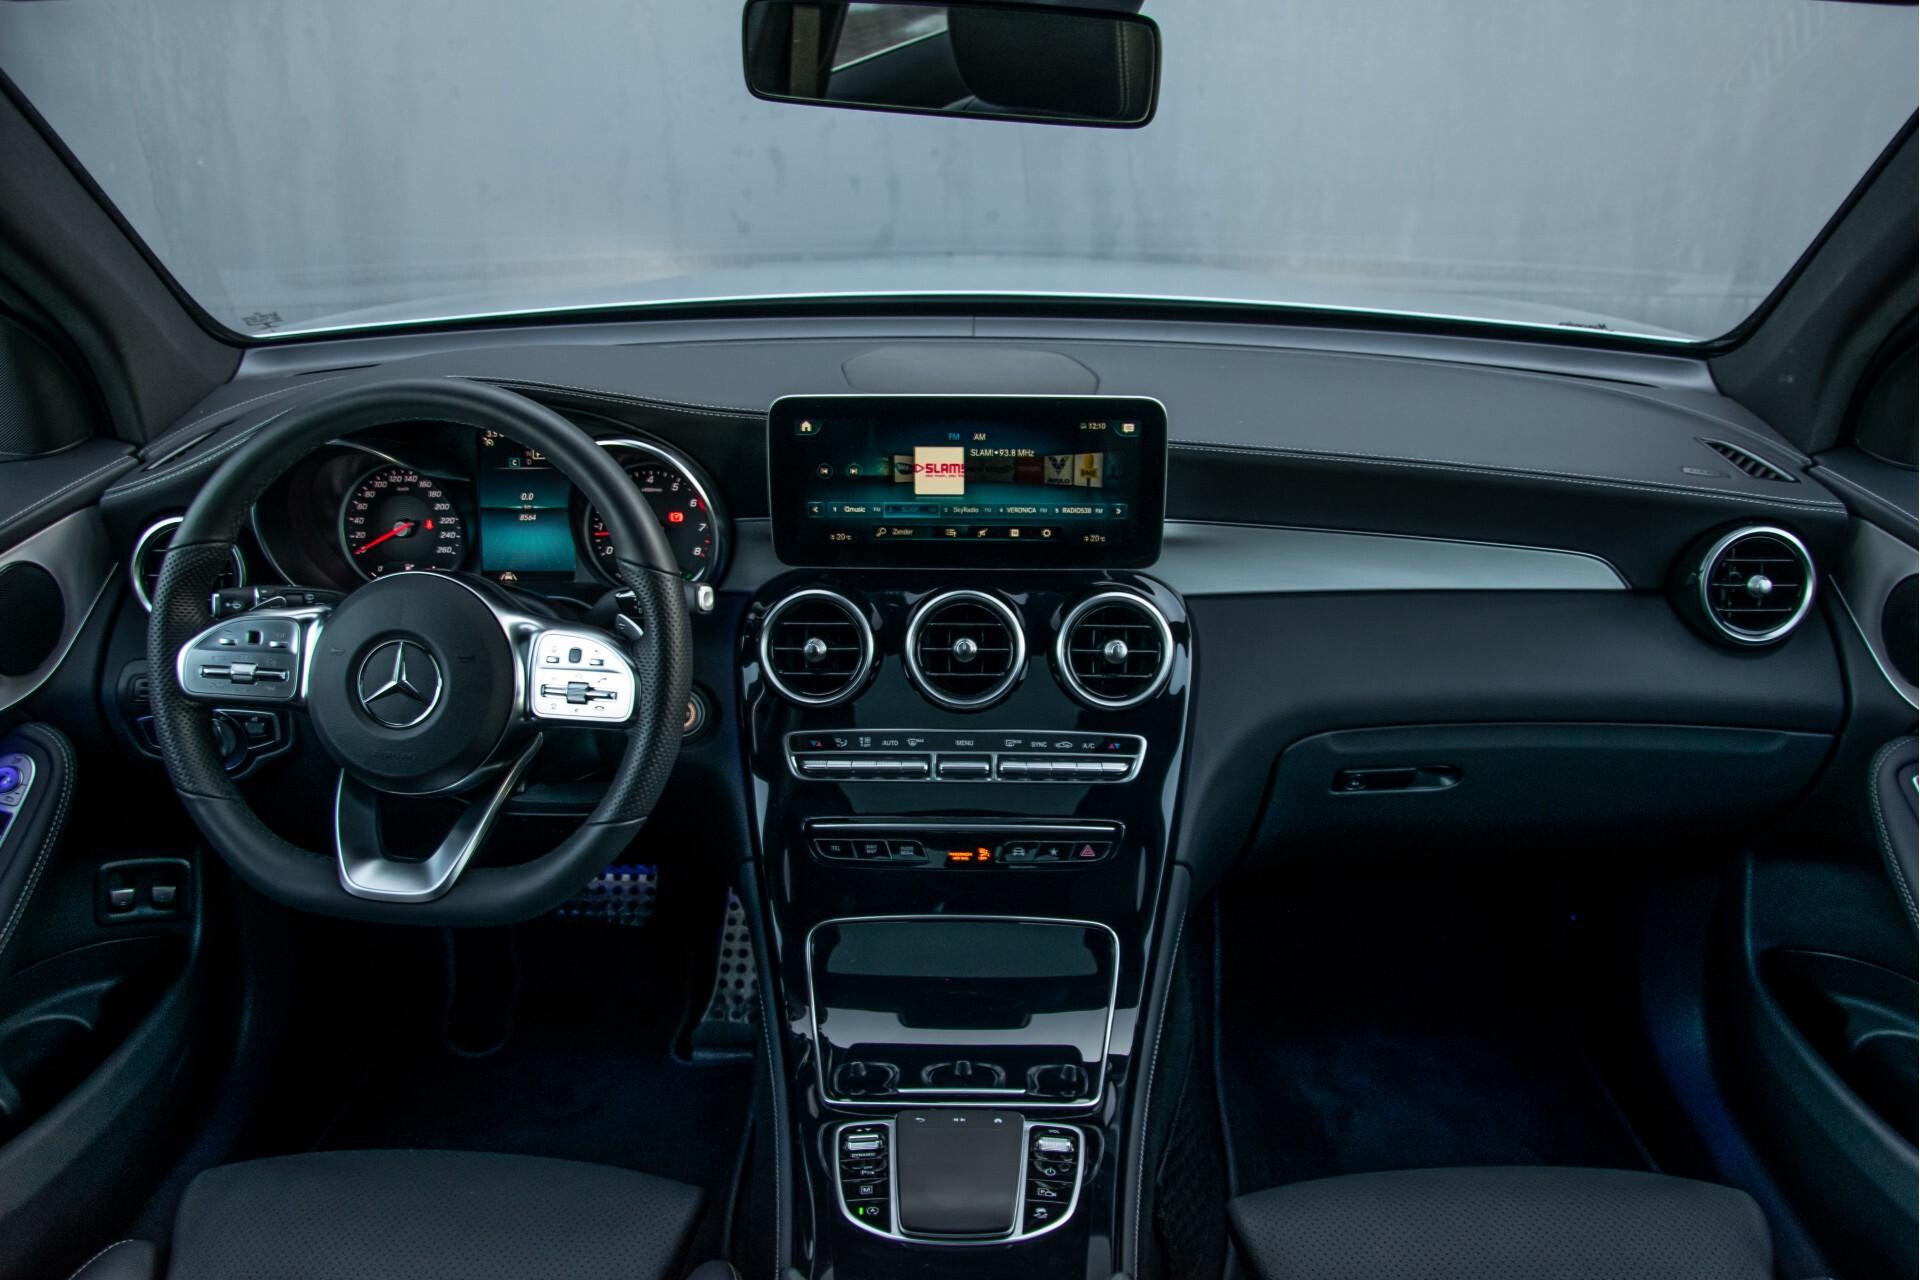 Mercedes-Benz GLC 300 4-M AMG Panorama/Keyless/Assistentiepakket/MBUX//Wegkl-trekhaak Aut9 Foto 8